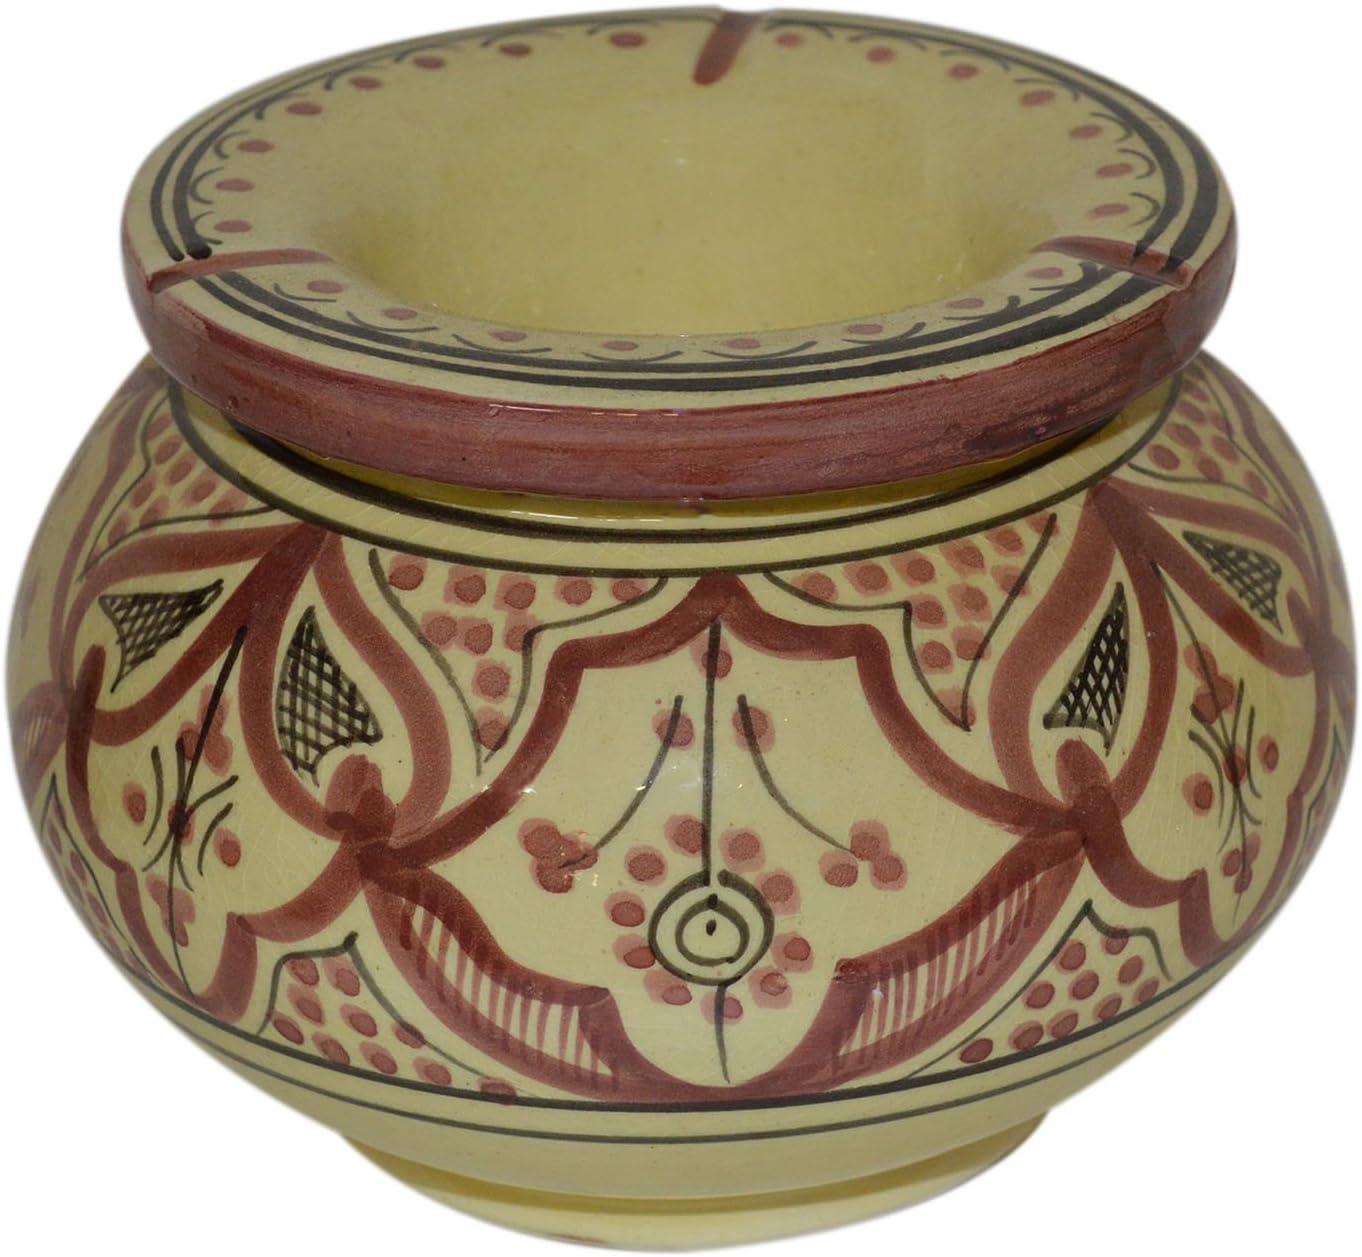 Moroccan Handmade Great Max 86% OFF interest Ceramic Ashtrays Cigar des Smokeless Exquisite